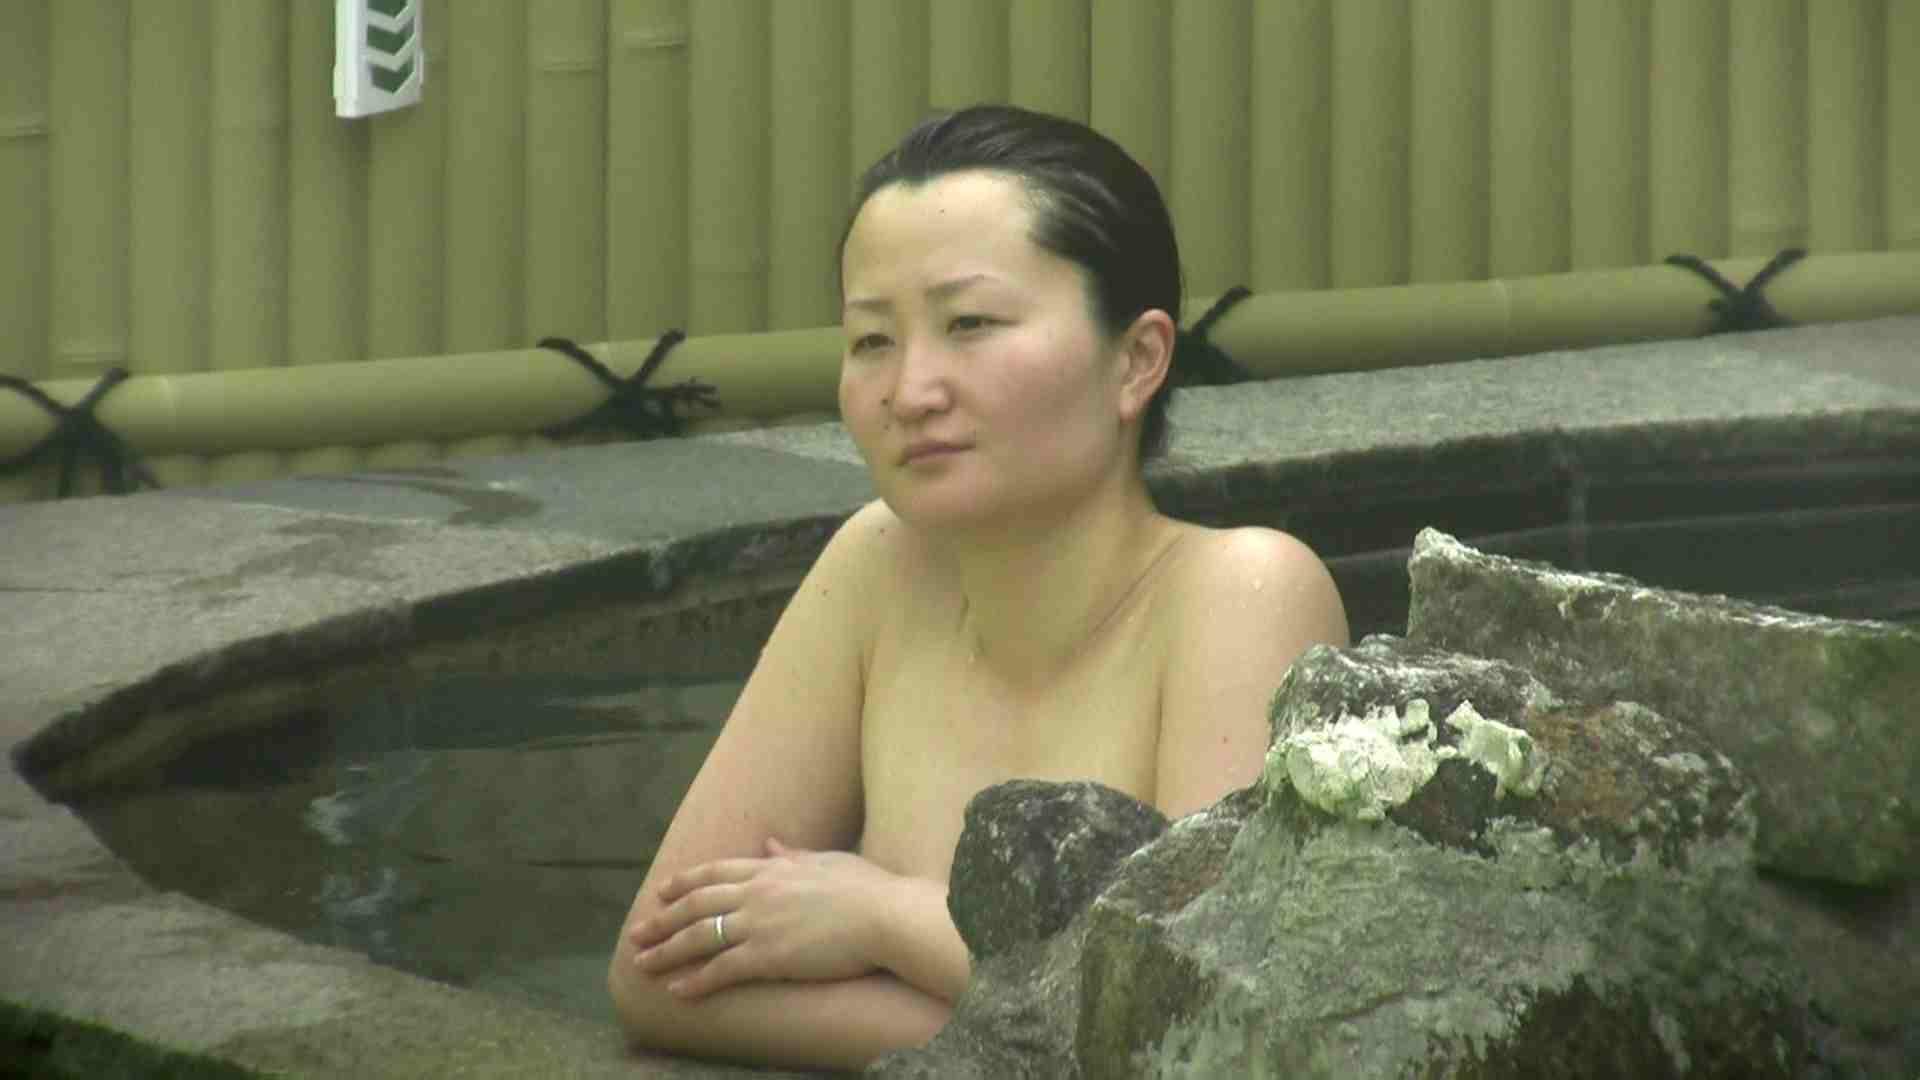 Aquaな露天風呂Vol.632 盗撮シリーズ | 露天風呂編  100PIX 19